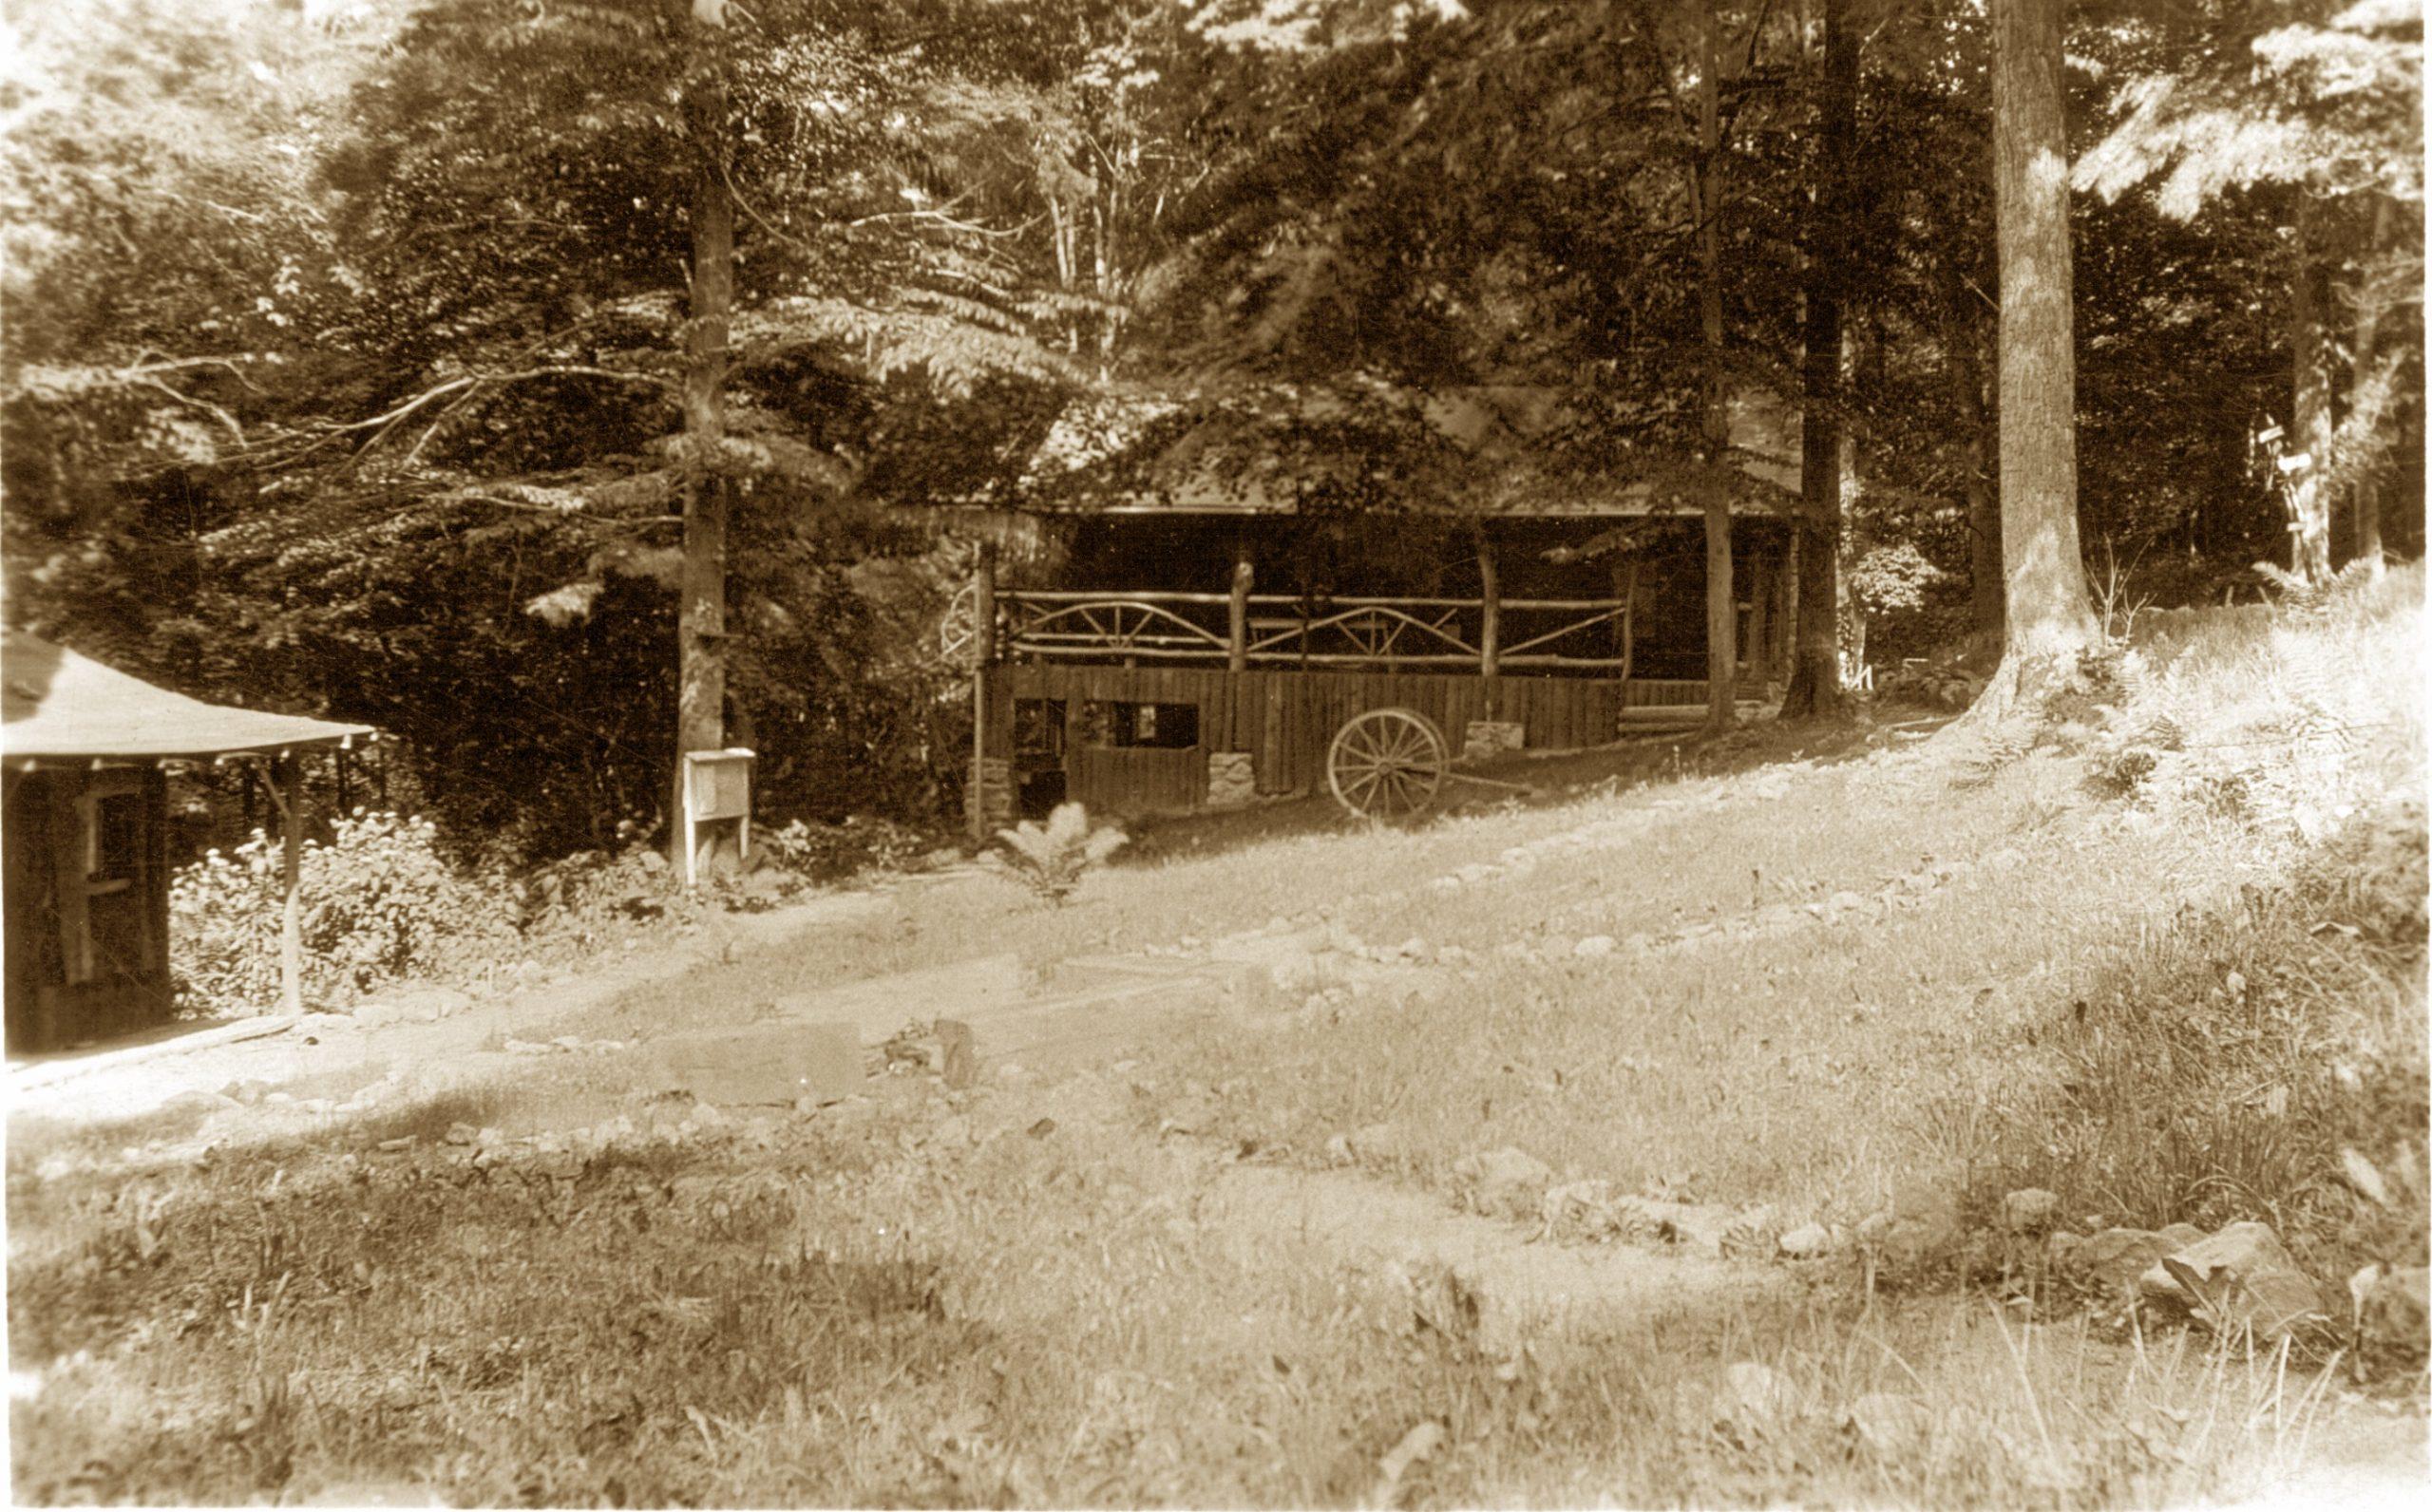 Long Lodge in 1925